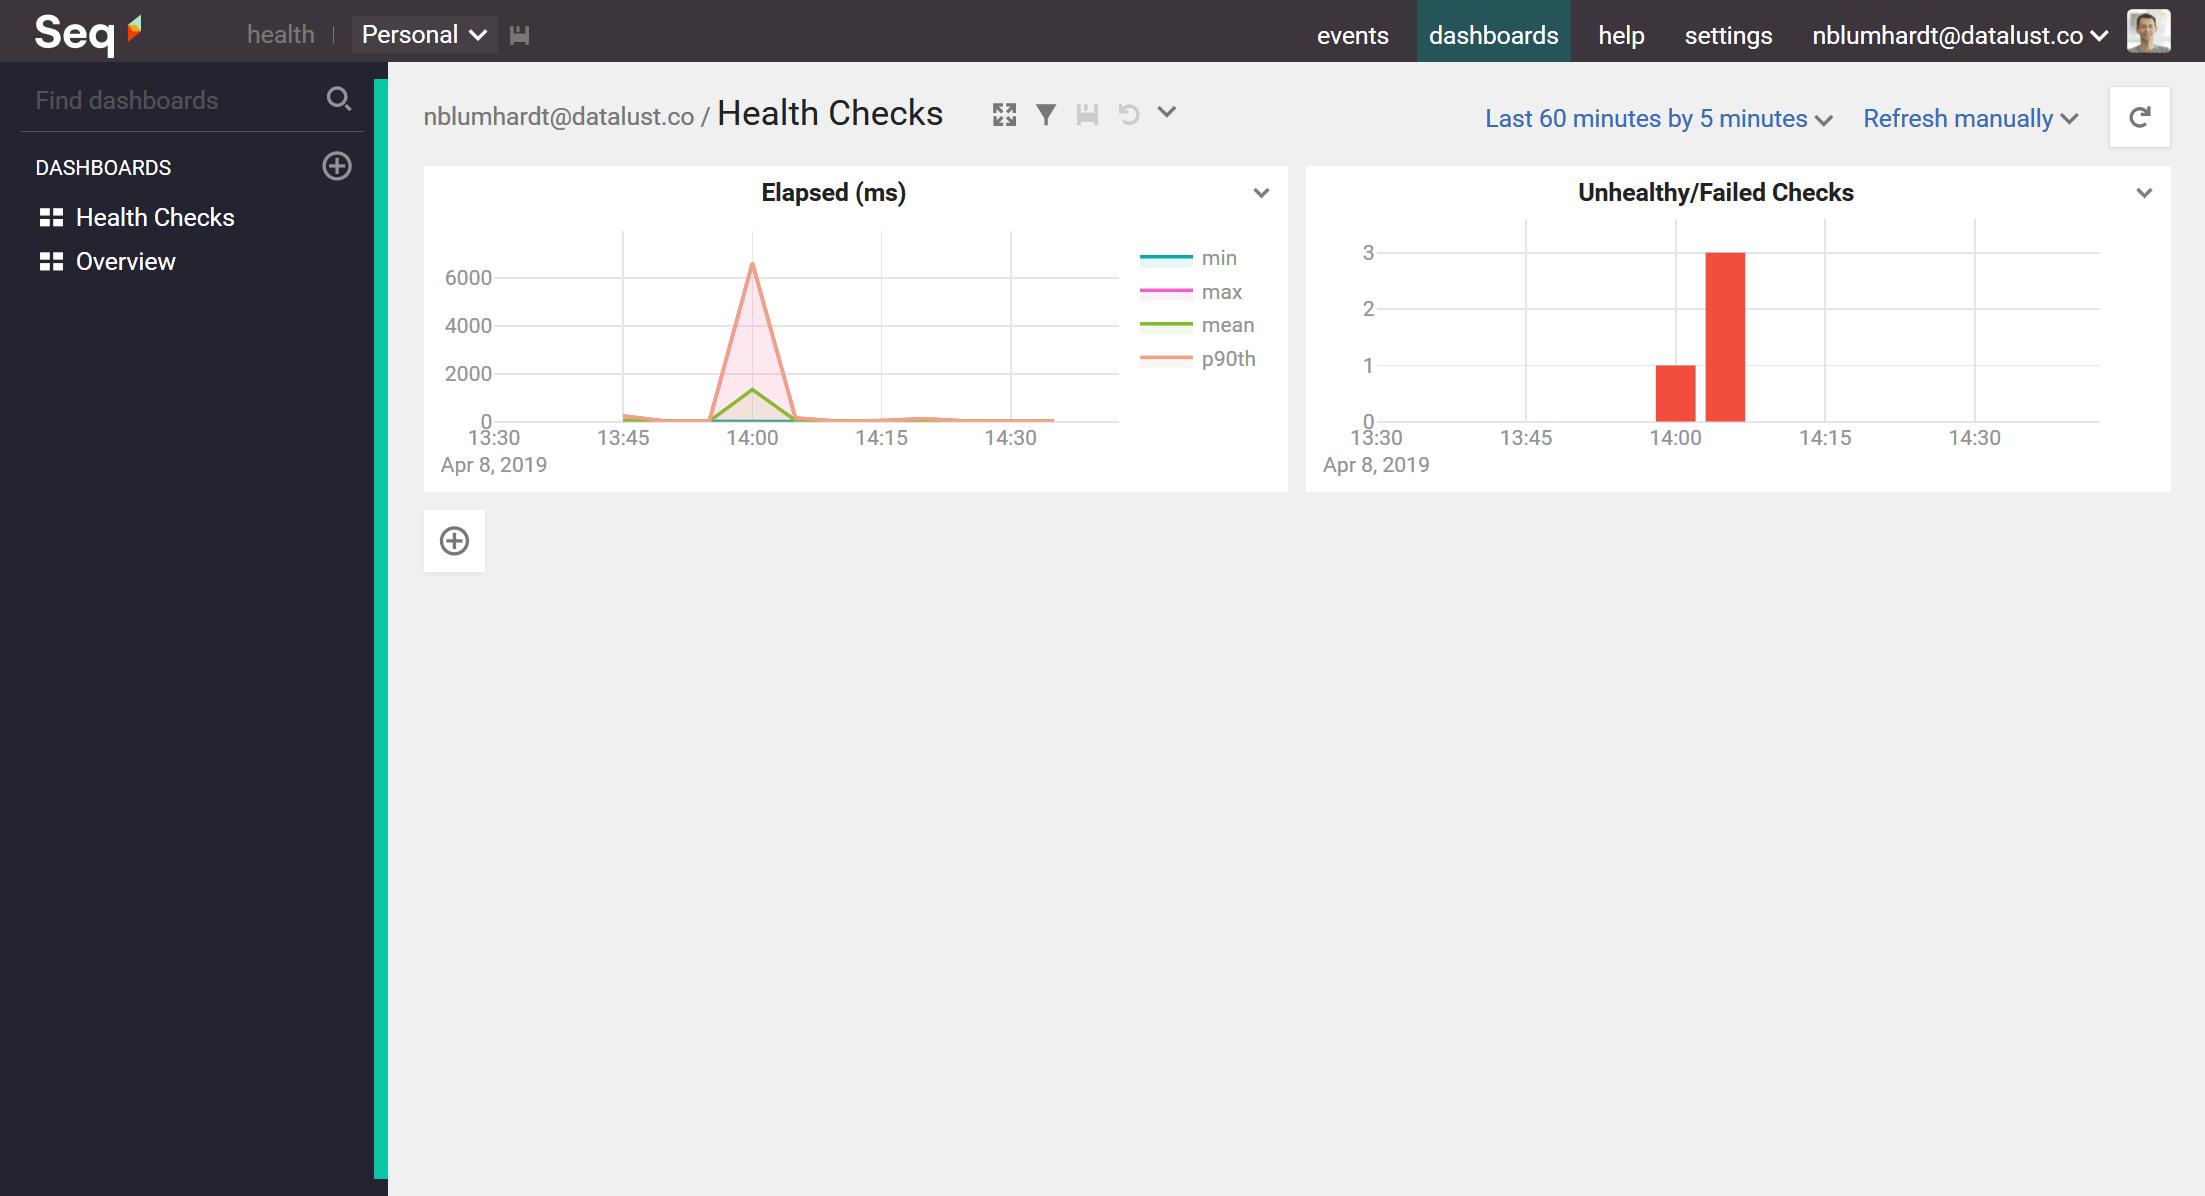 Simple health check dashboard